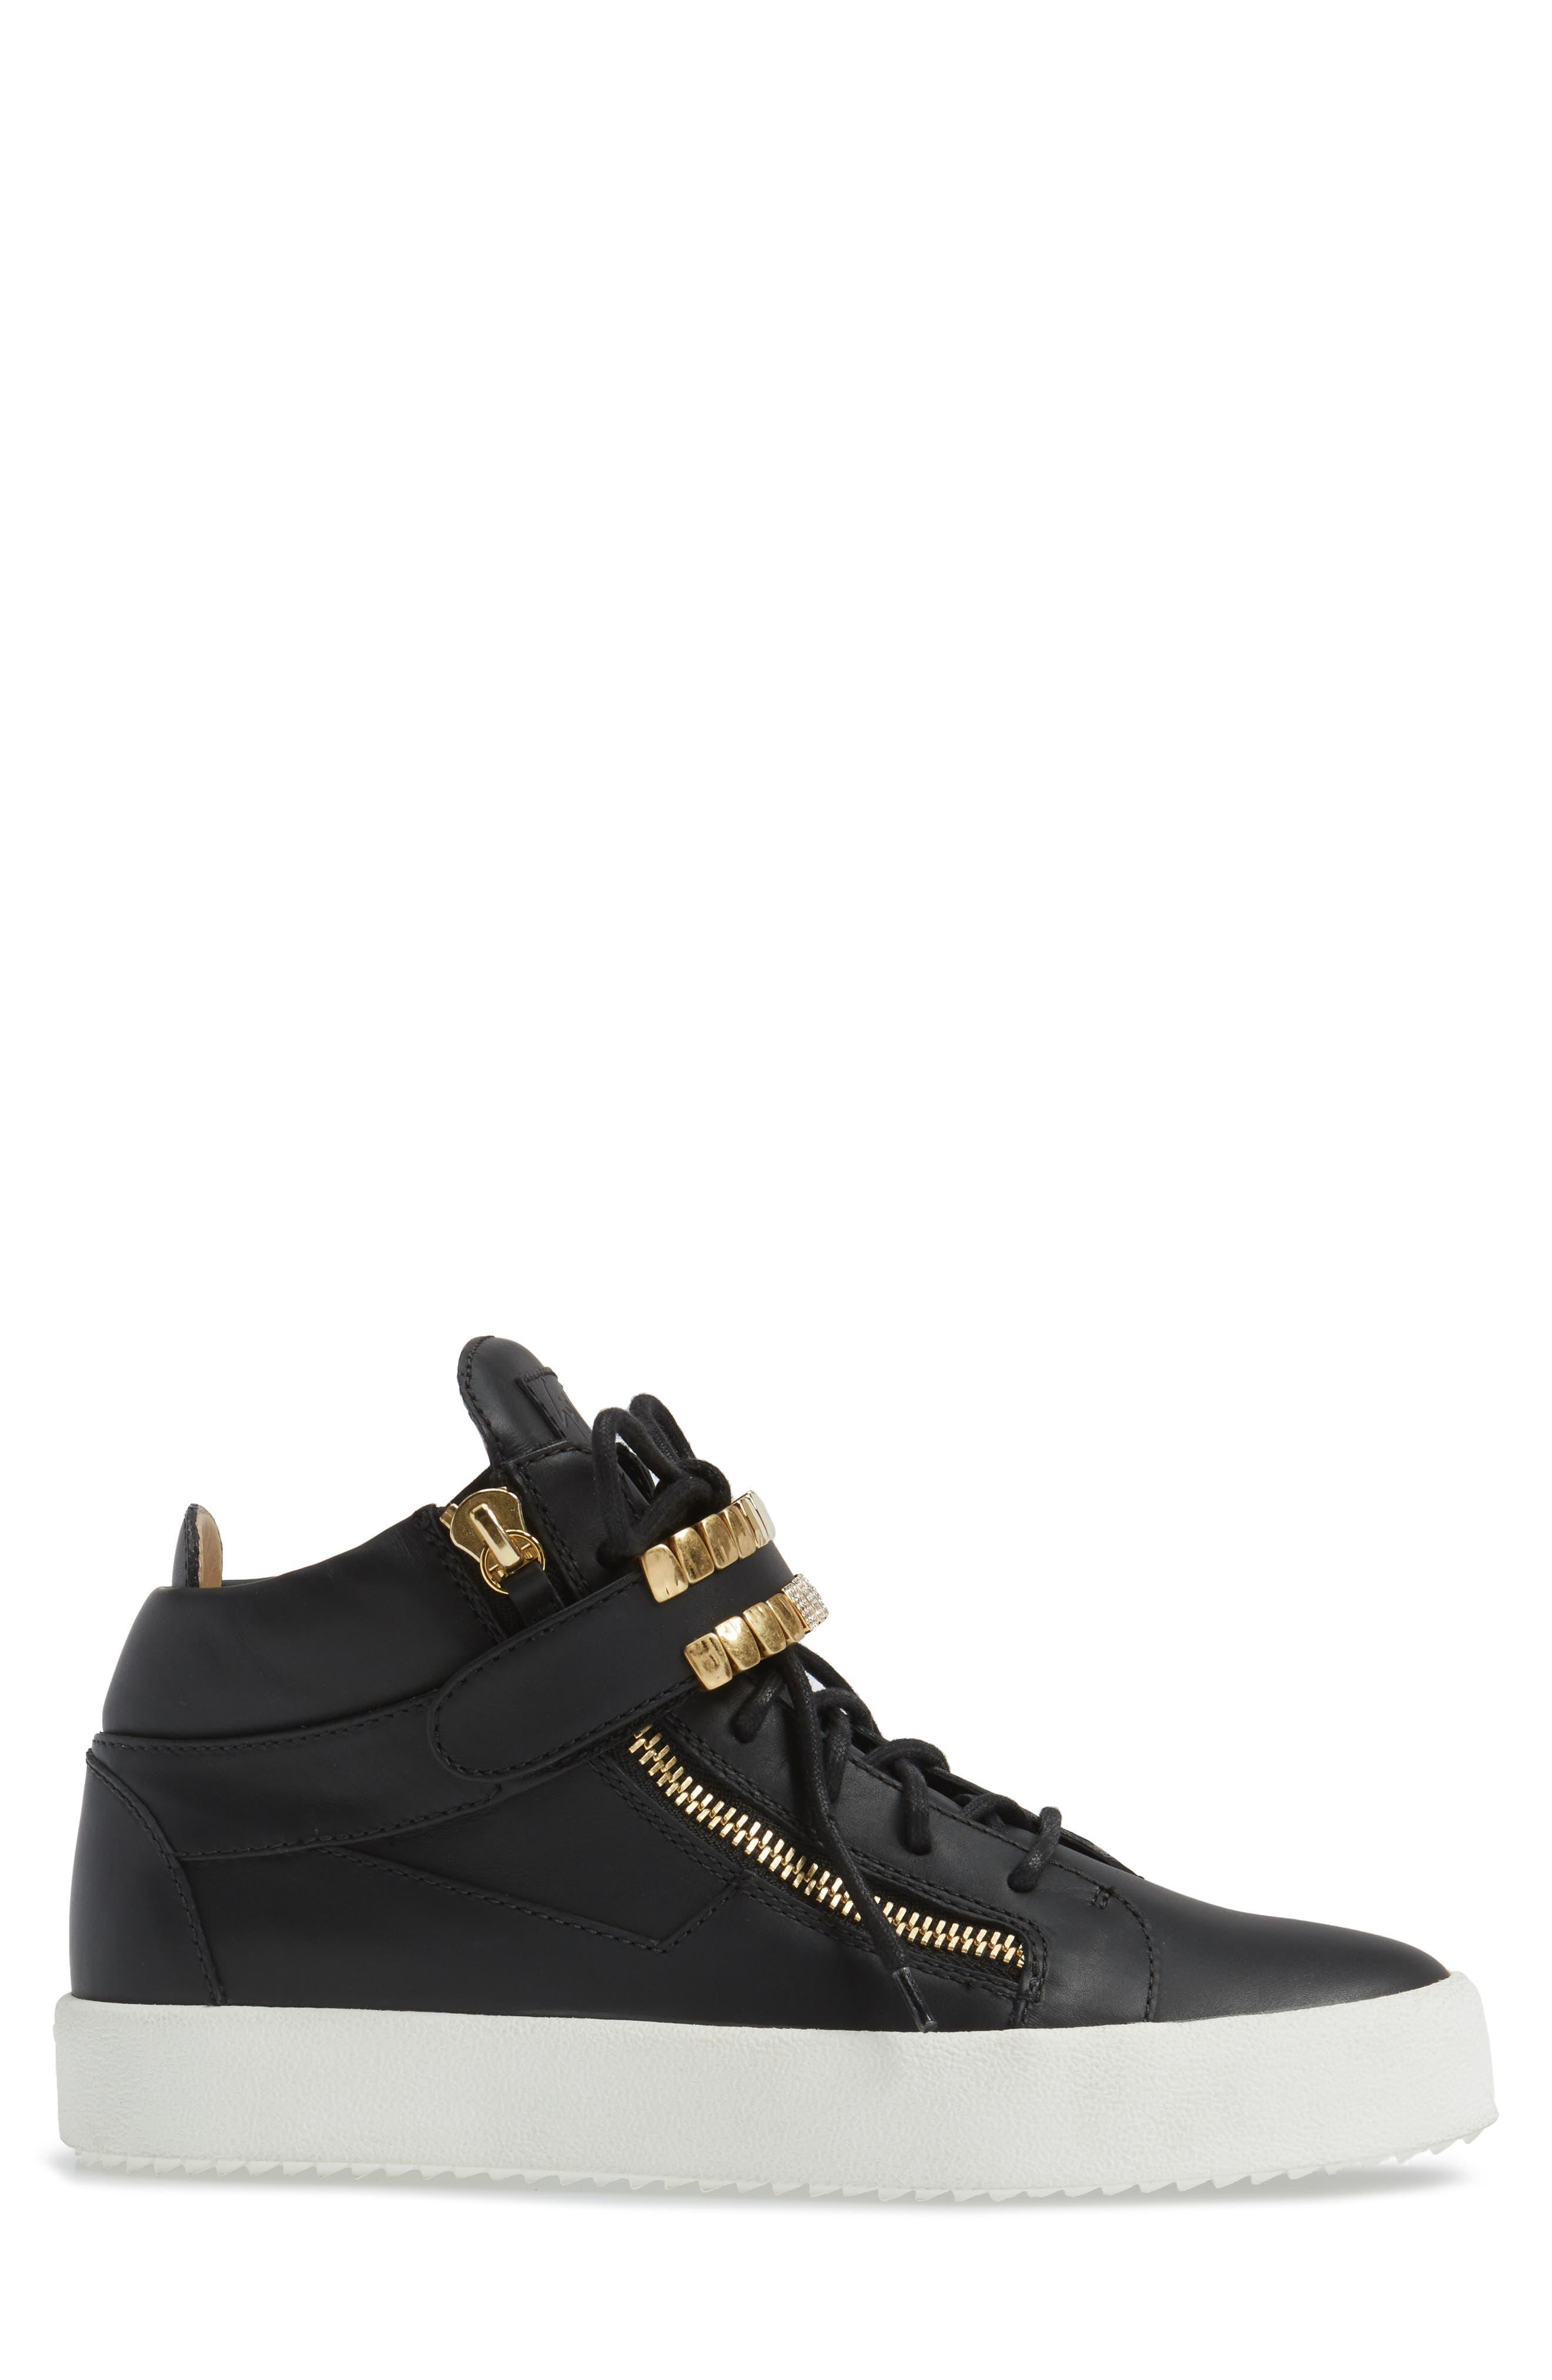 Alternate Image 3  - Giuseppe Zanotti Mid Top Sneaker (Men)